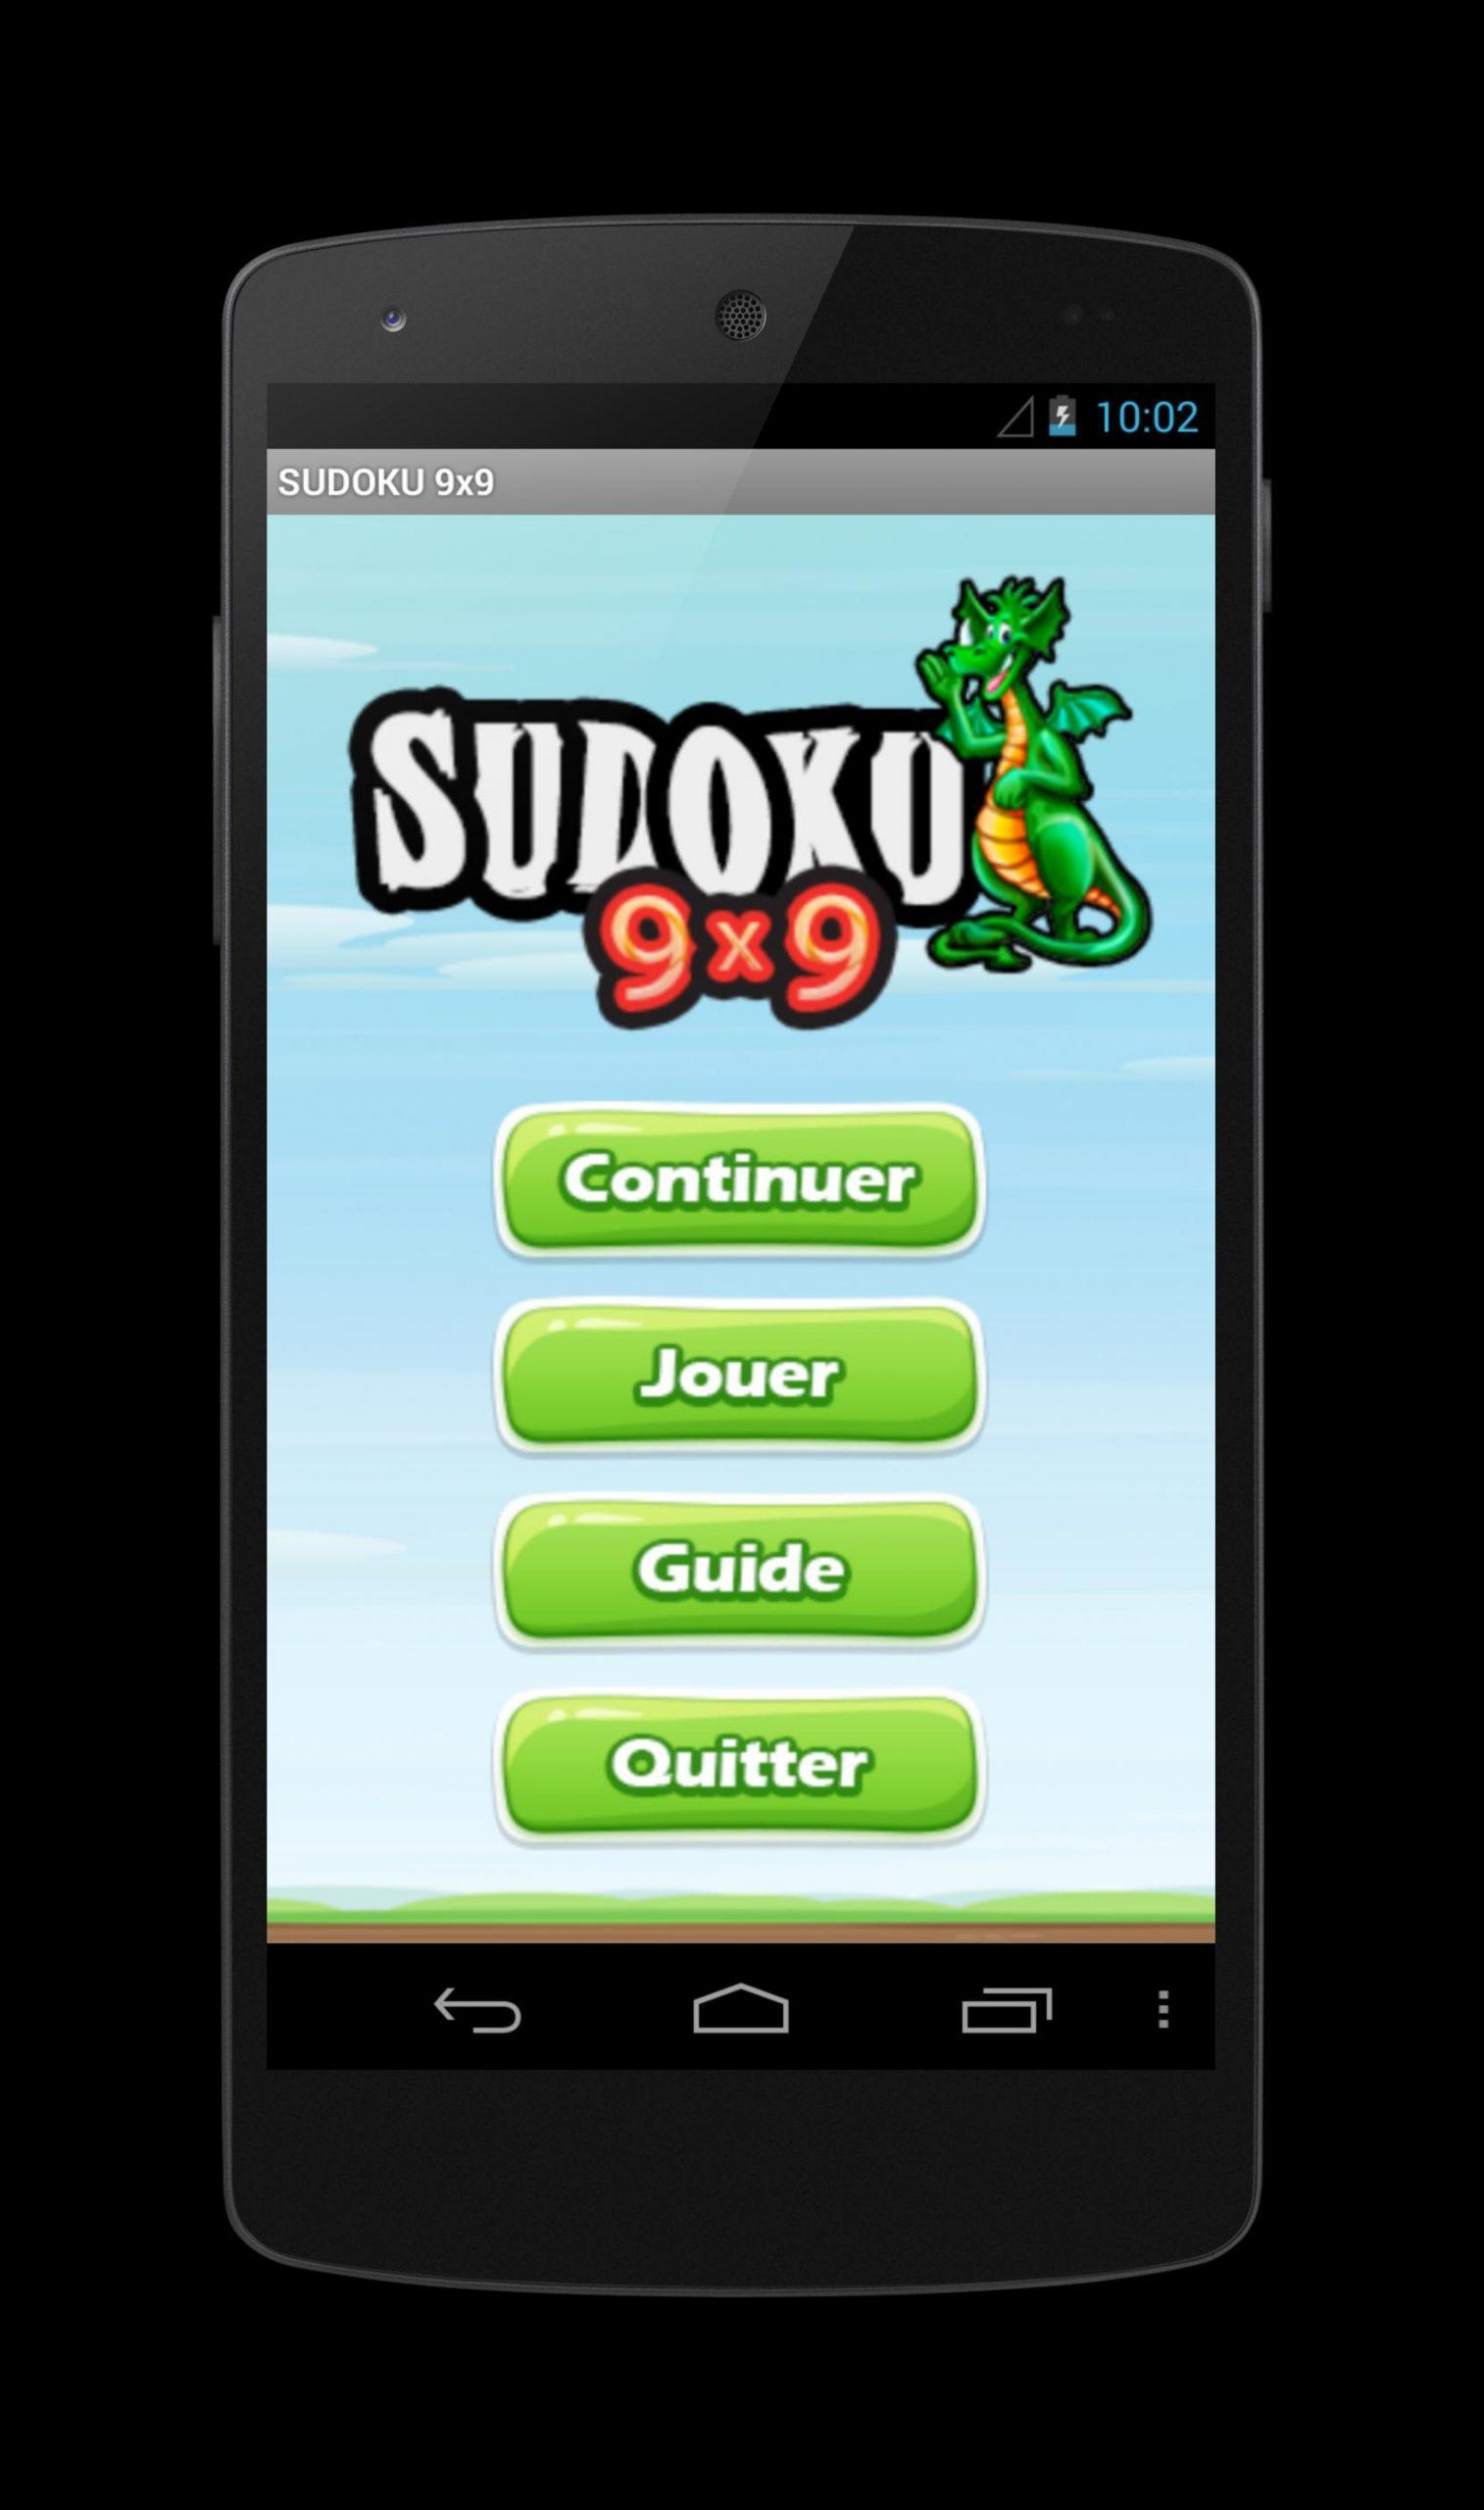 Android Için Sudoku 9X9 - Apk'yı İndir tout Sudoku Facile Avec Solution